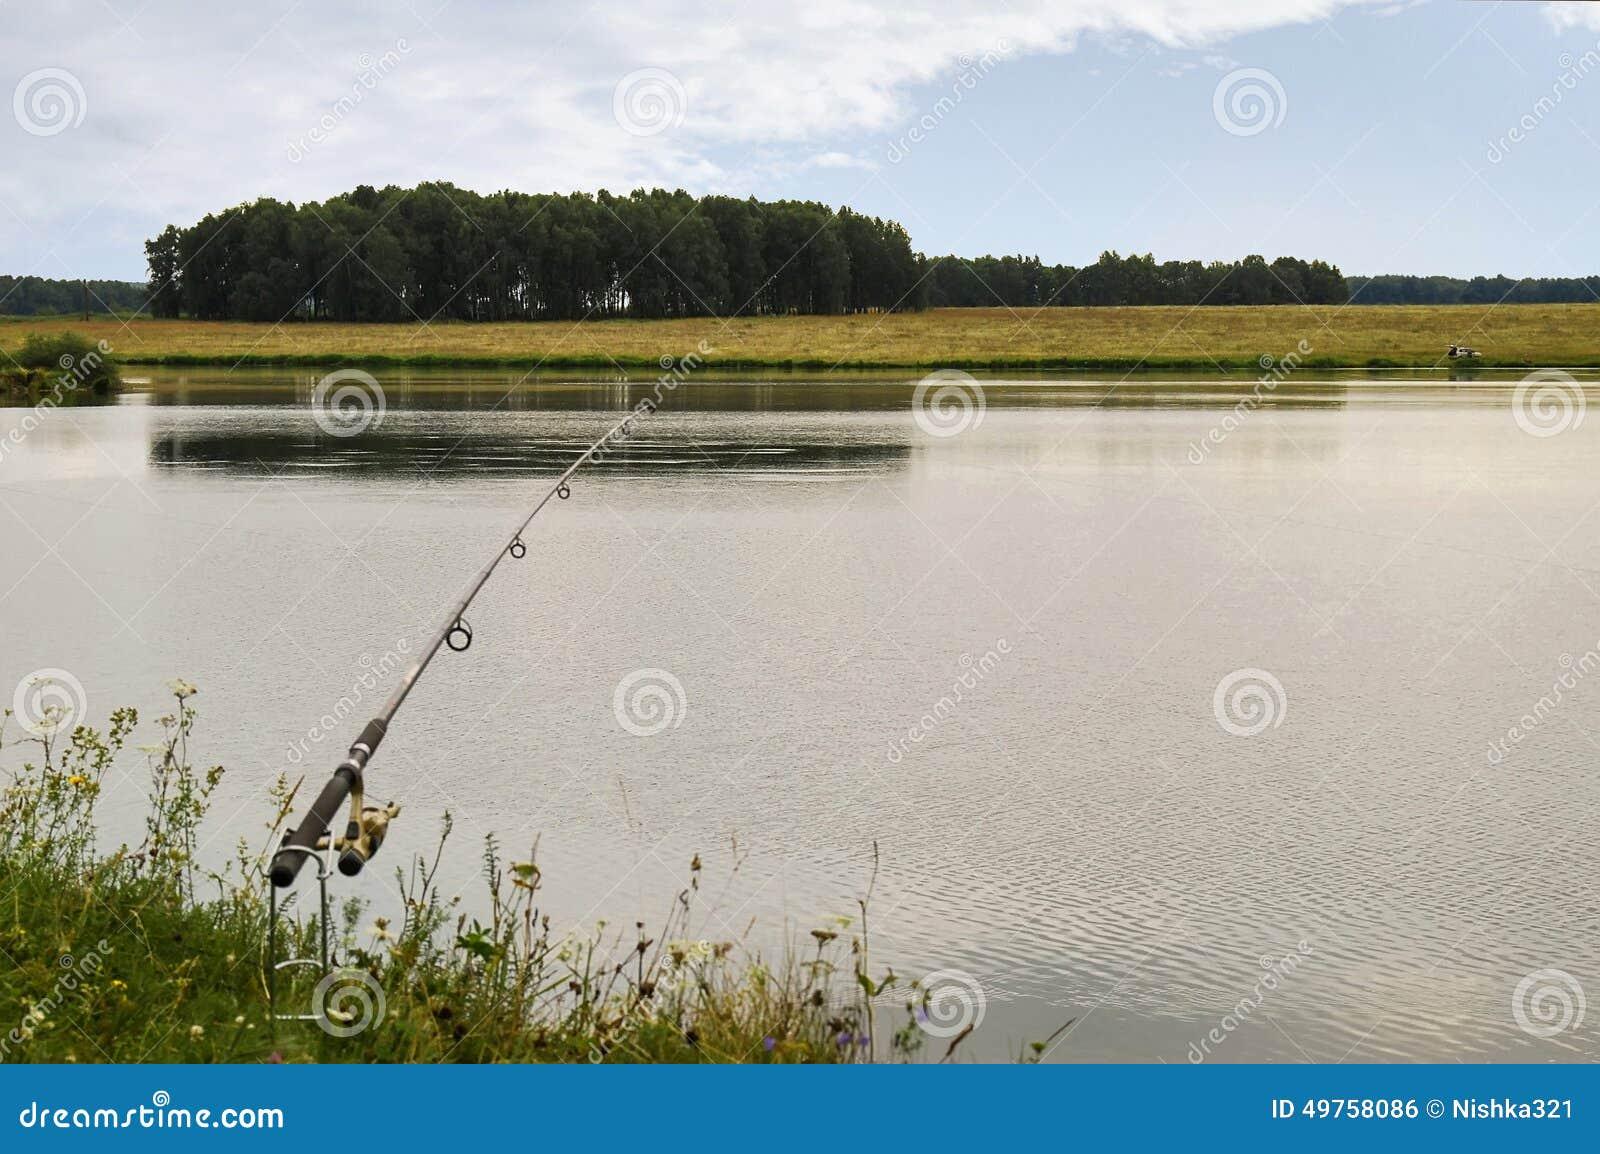 Fishing for River fishing pole